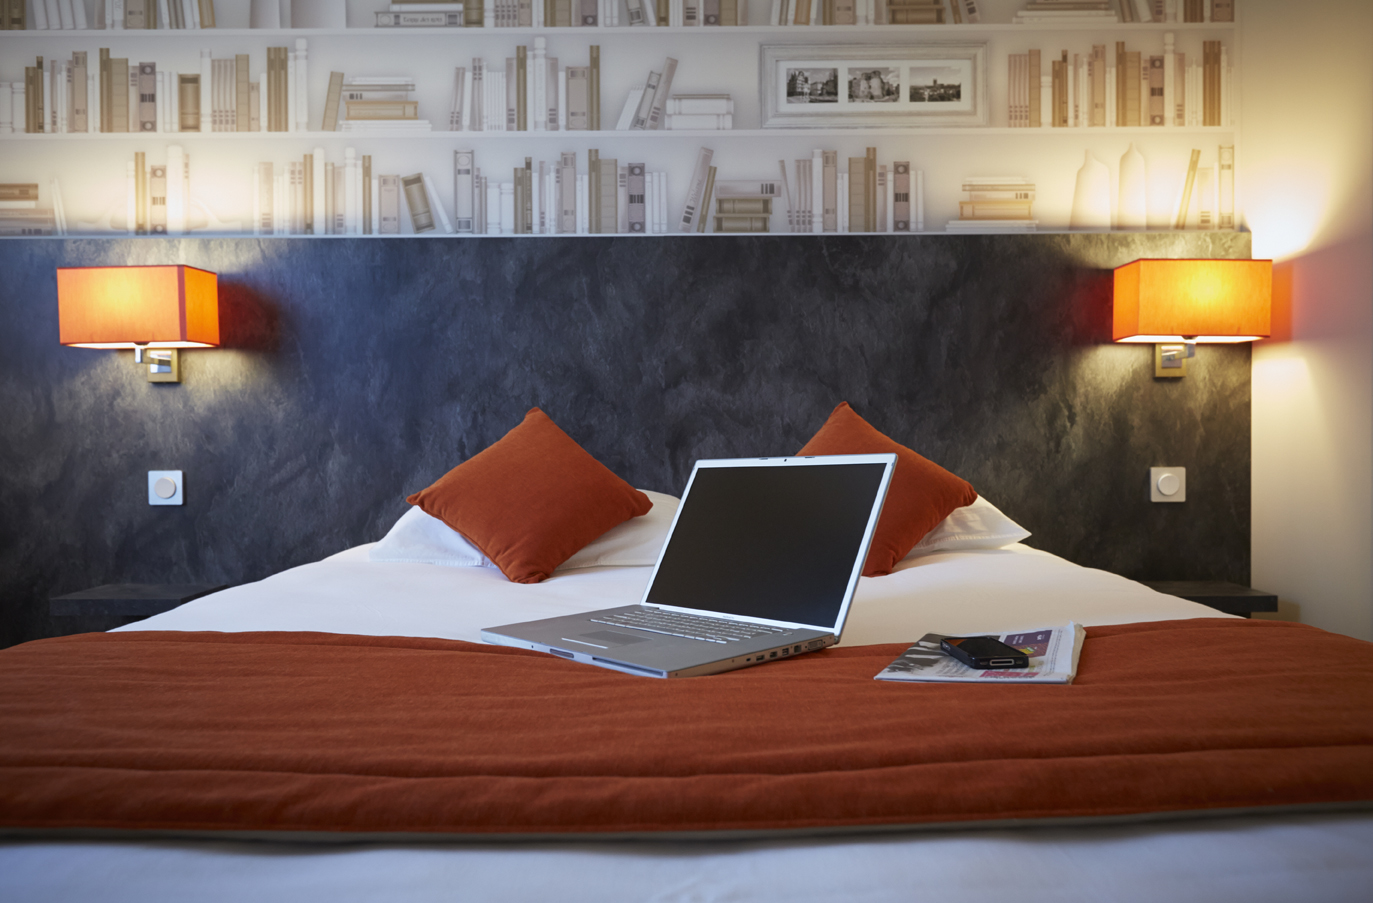 hotel kyriad angers beaucouze - géraldine fourny - decoratrice d interieur nantes 44 - décoration hotel 2